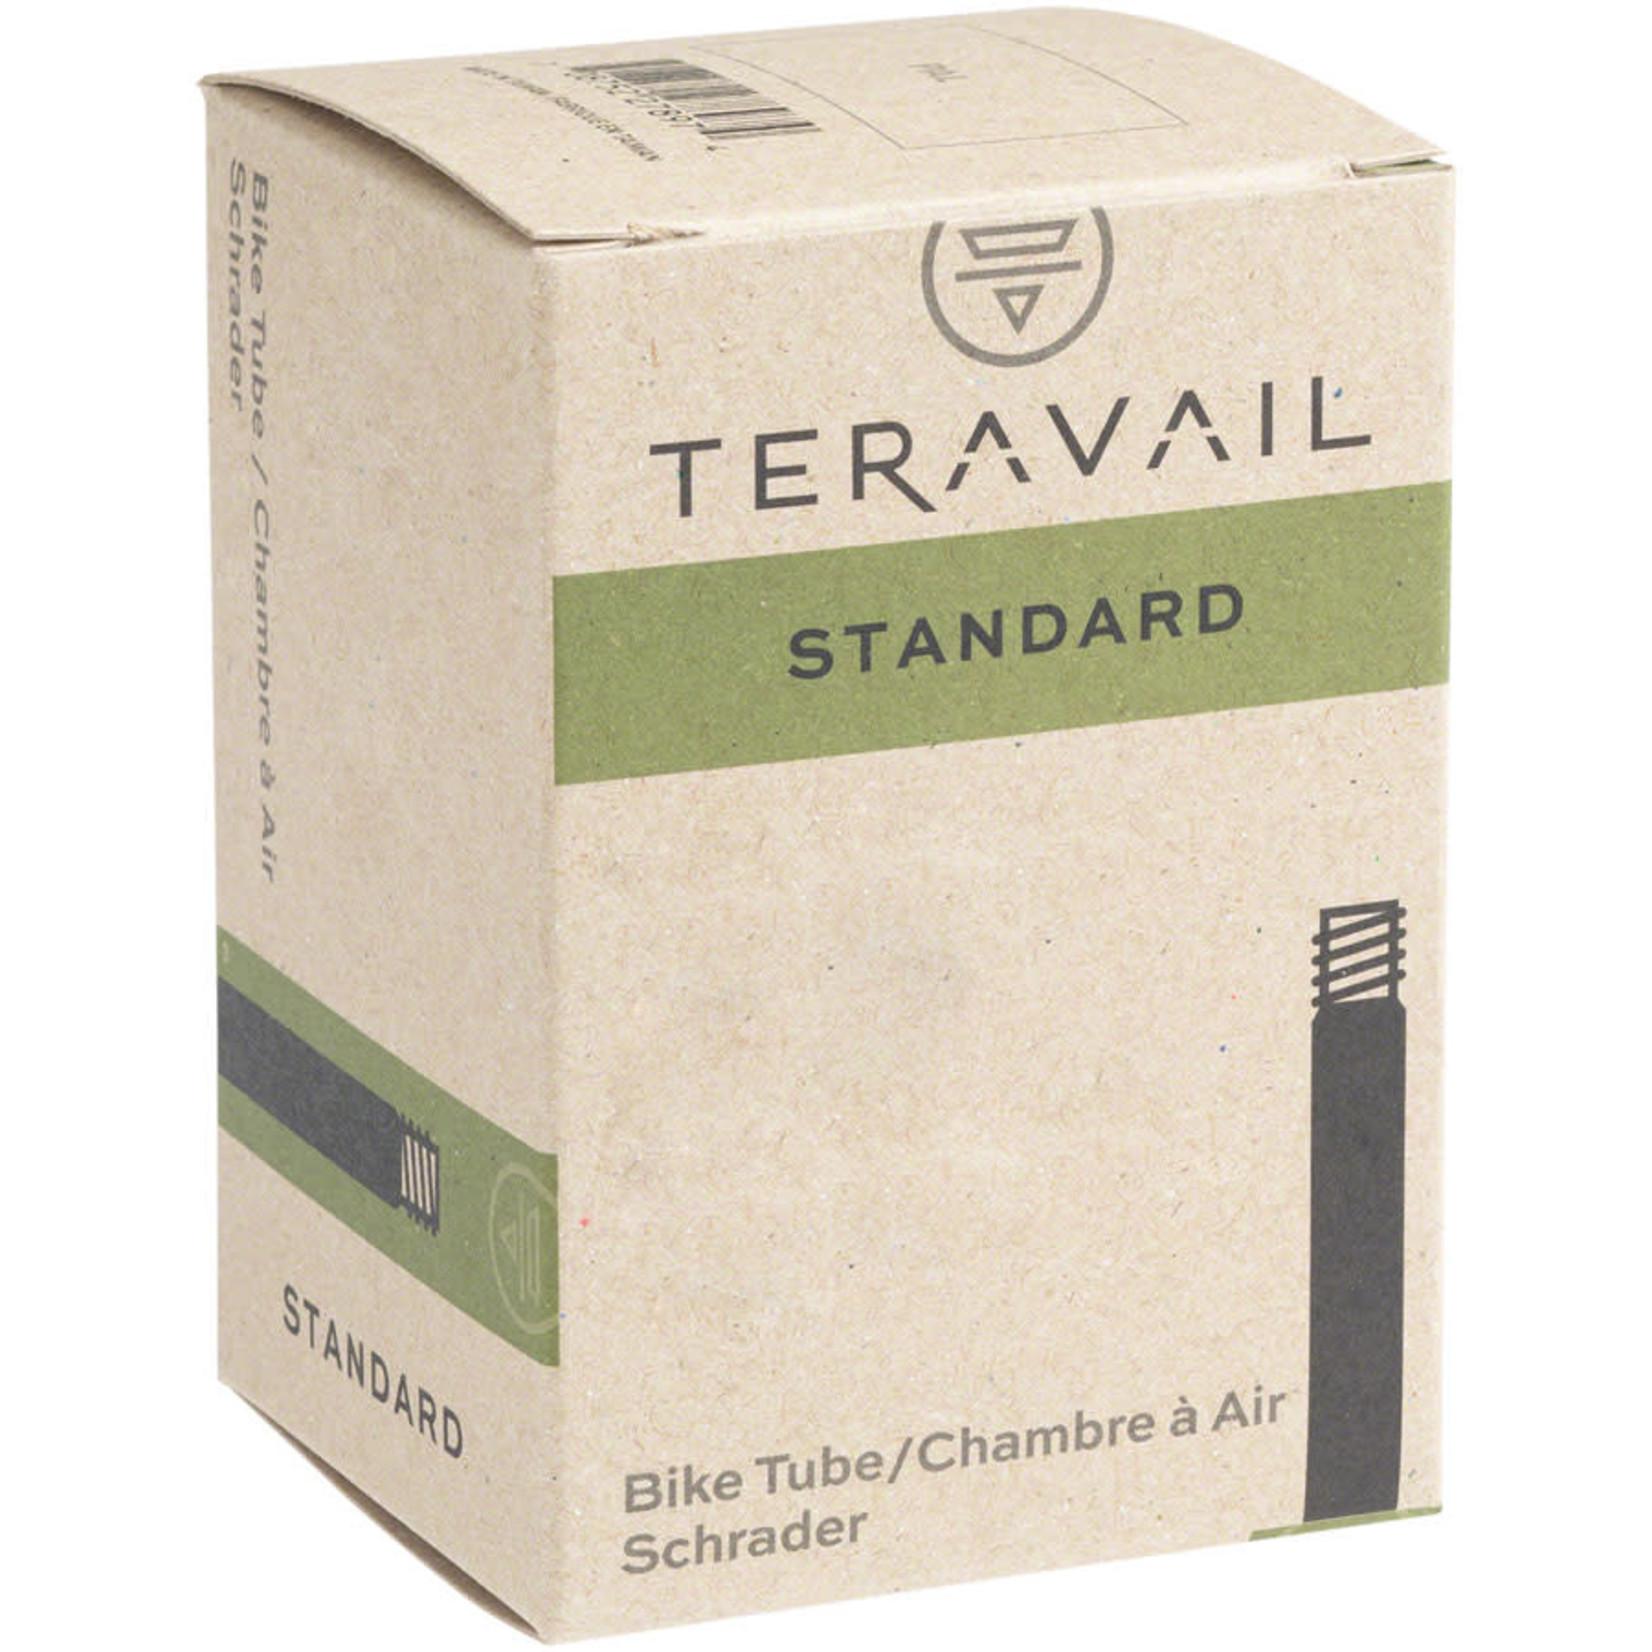 "Q-Tubes Q-Tubes / Teravail 14"" x 1.5-2.25"" Tube: Low Lead Schrader Valve"